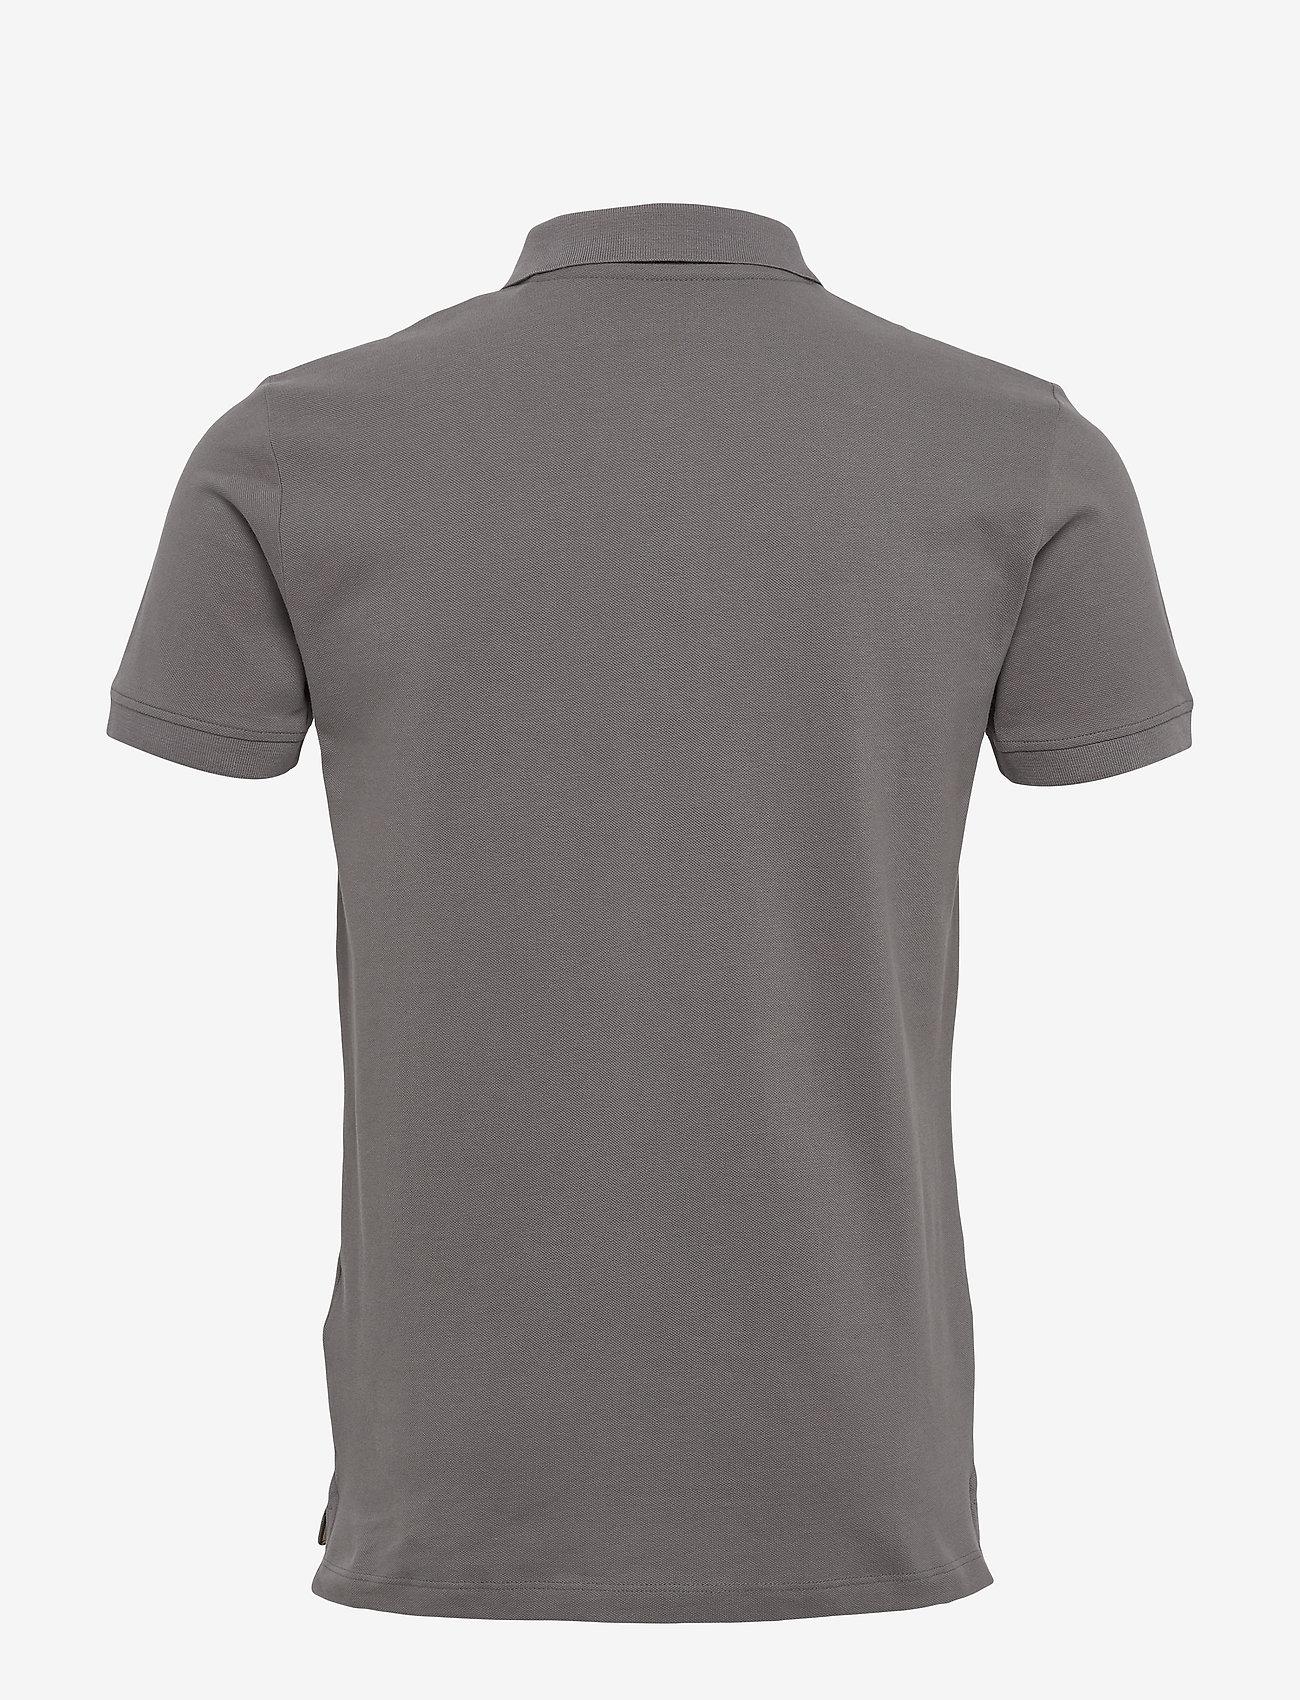 Esprit Casual - Polo shirts - short-sleeved polos - dark grey - 1